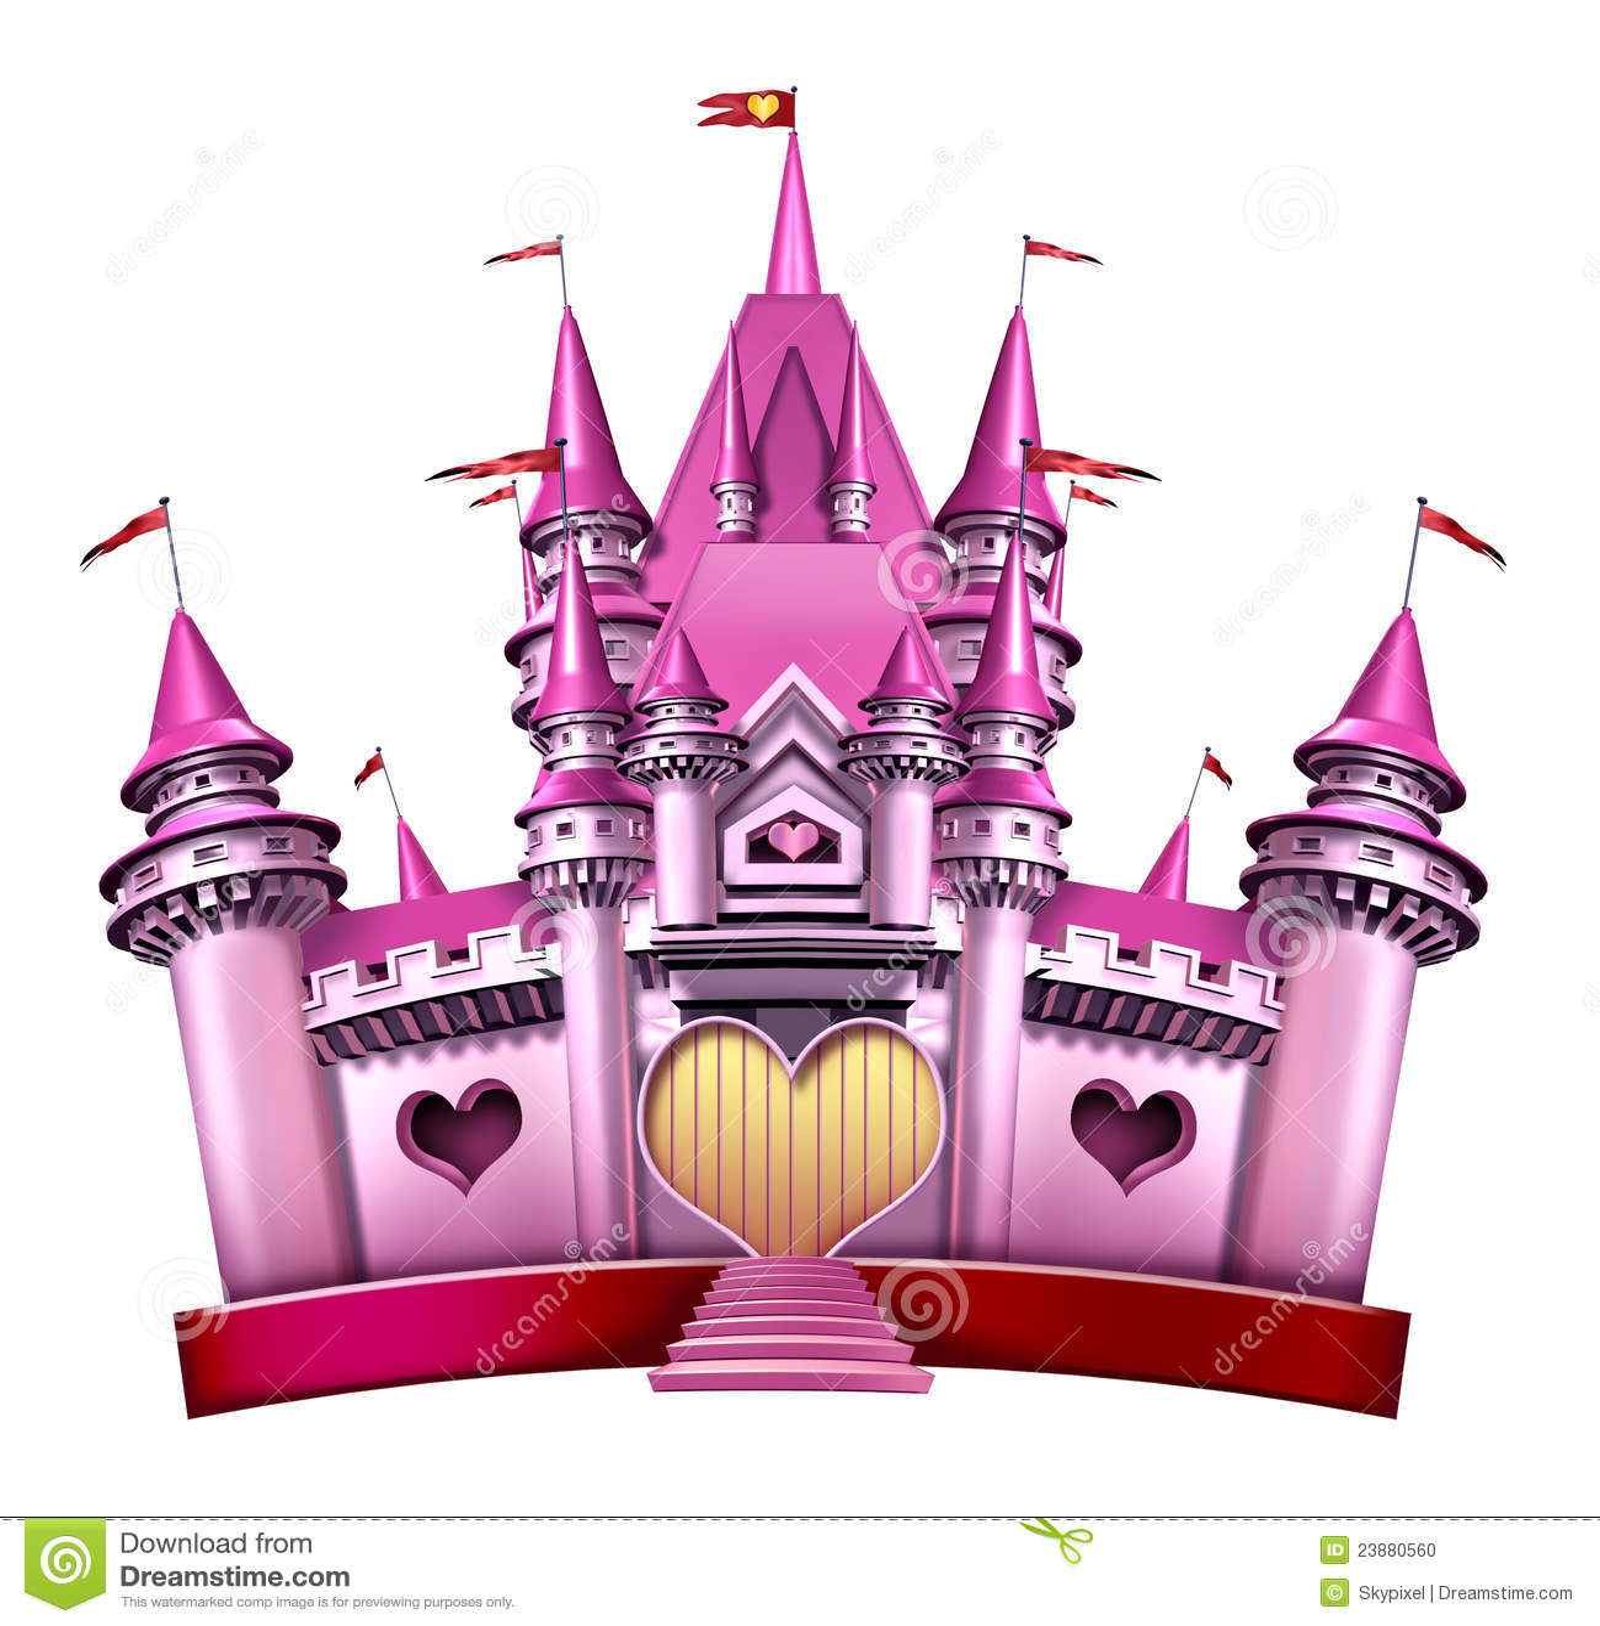 Pink Princess Castle Stock Illustration. Illustration Of